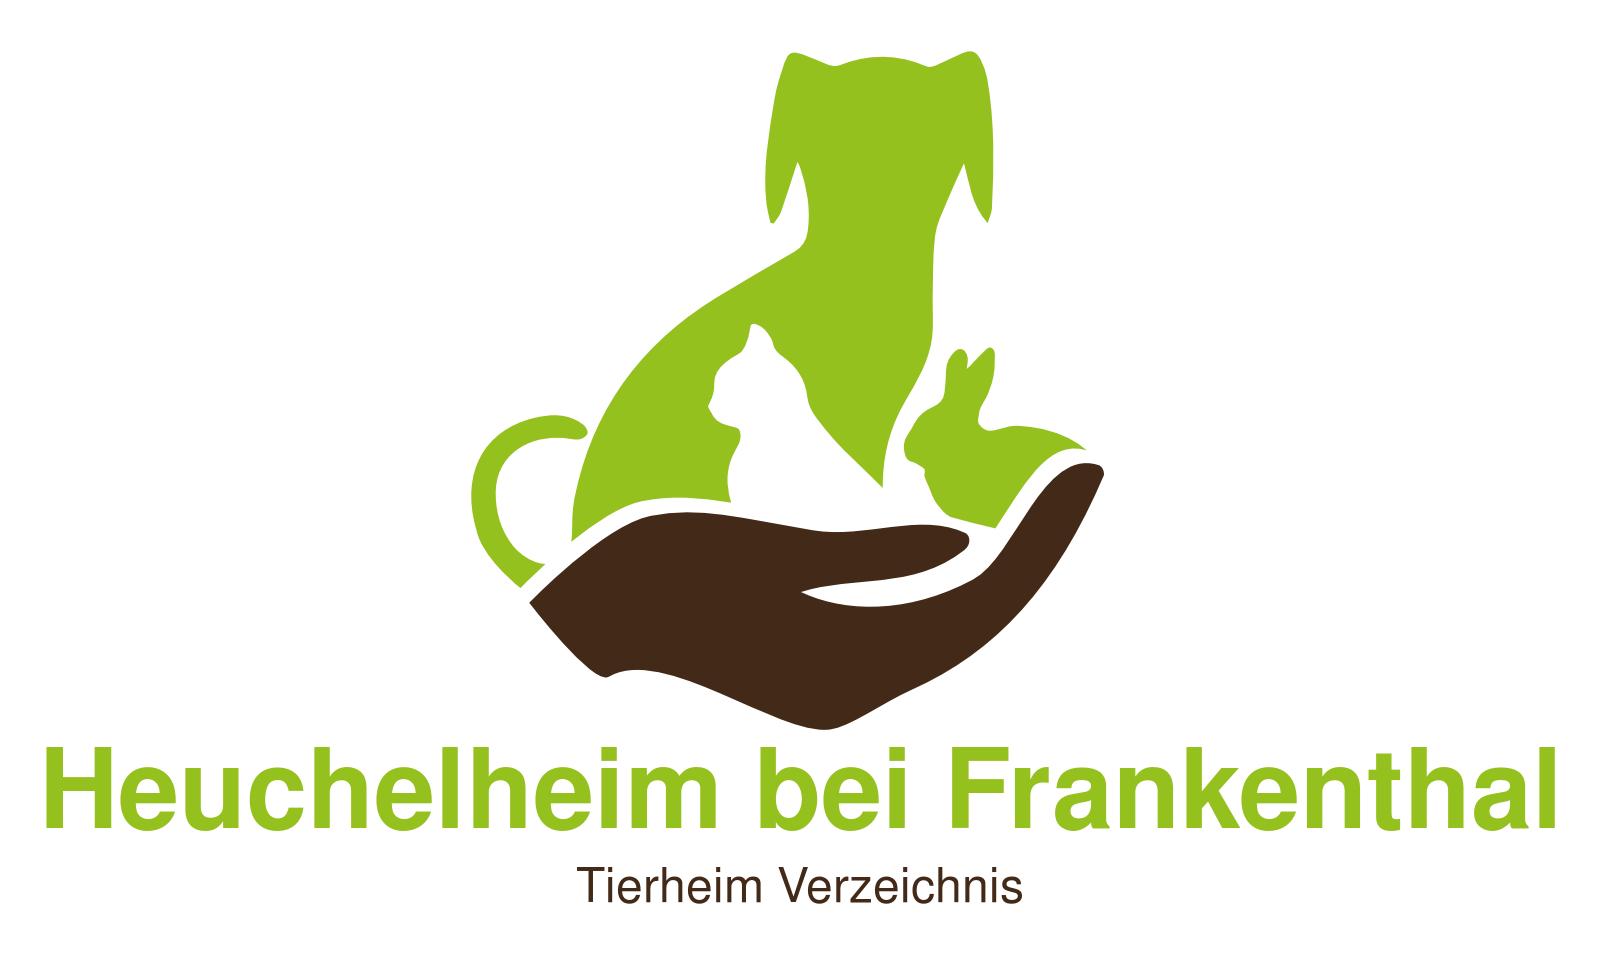 Tierheim Heuchelheim bei Frankenthal